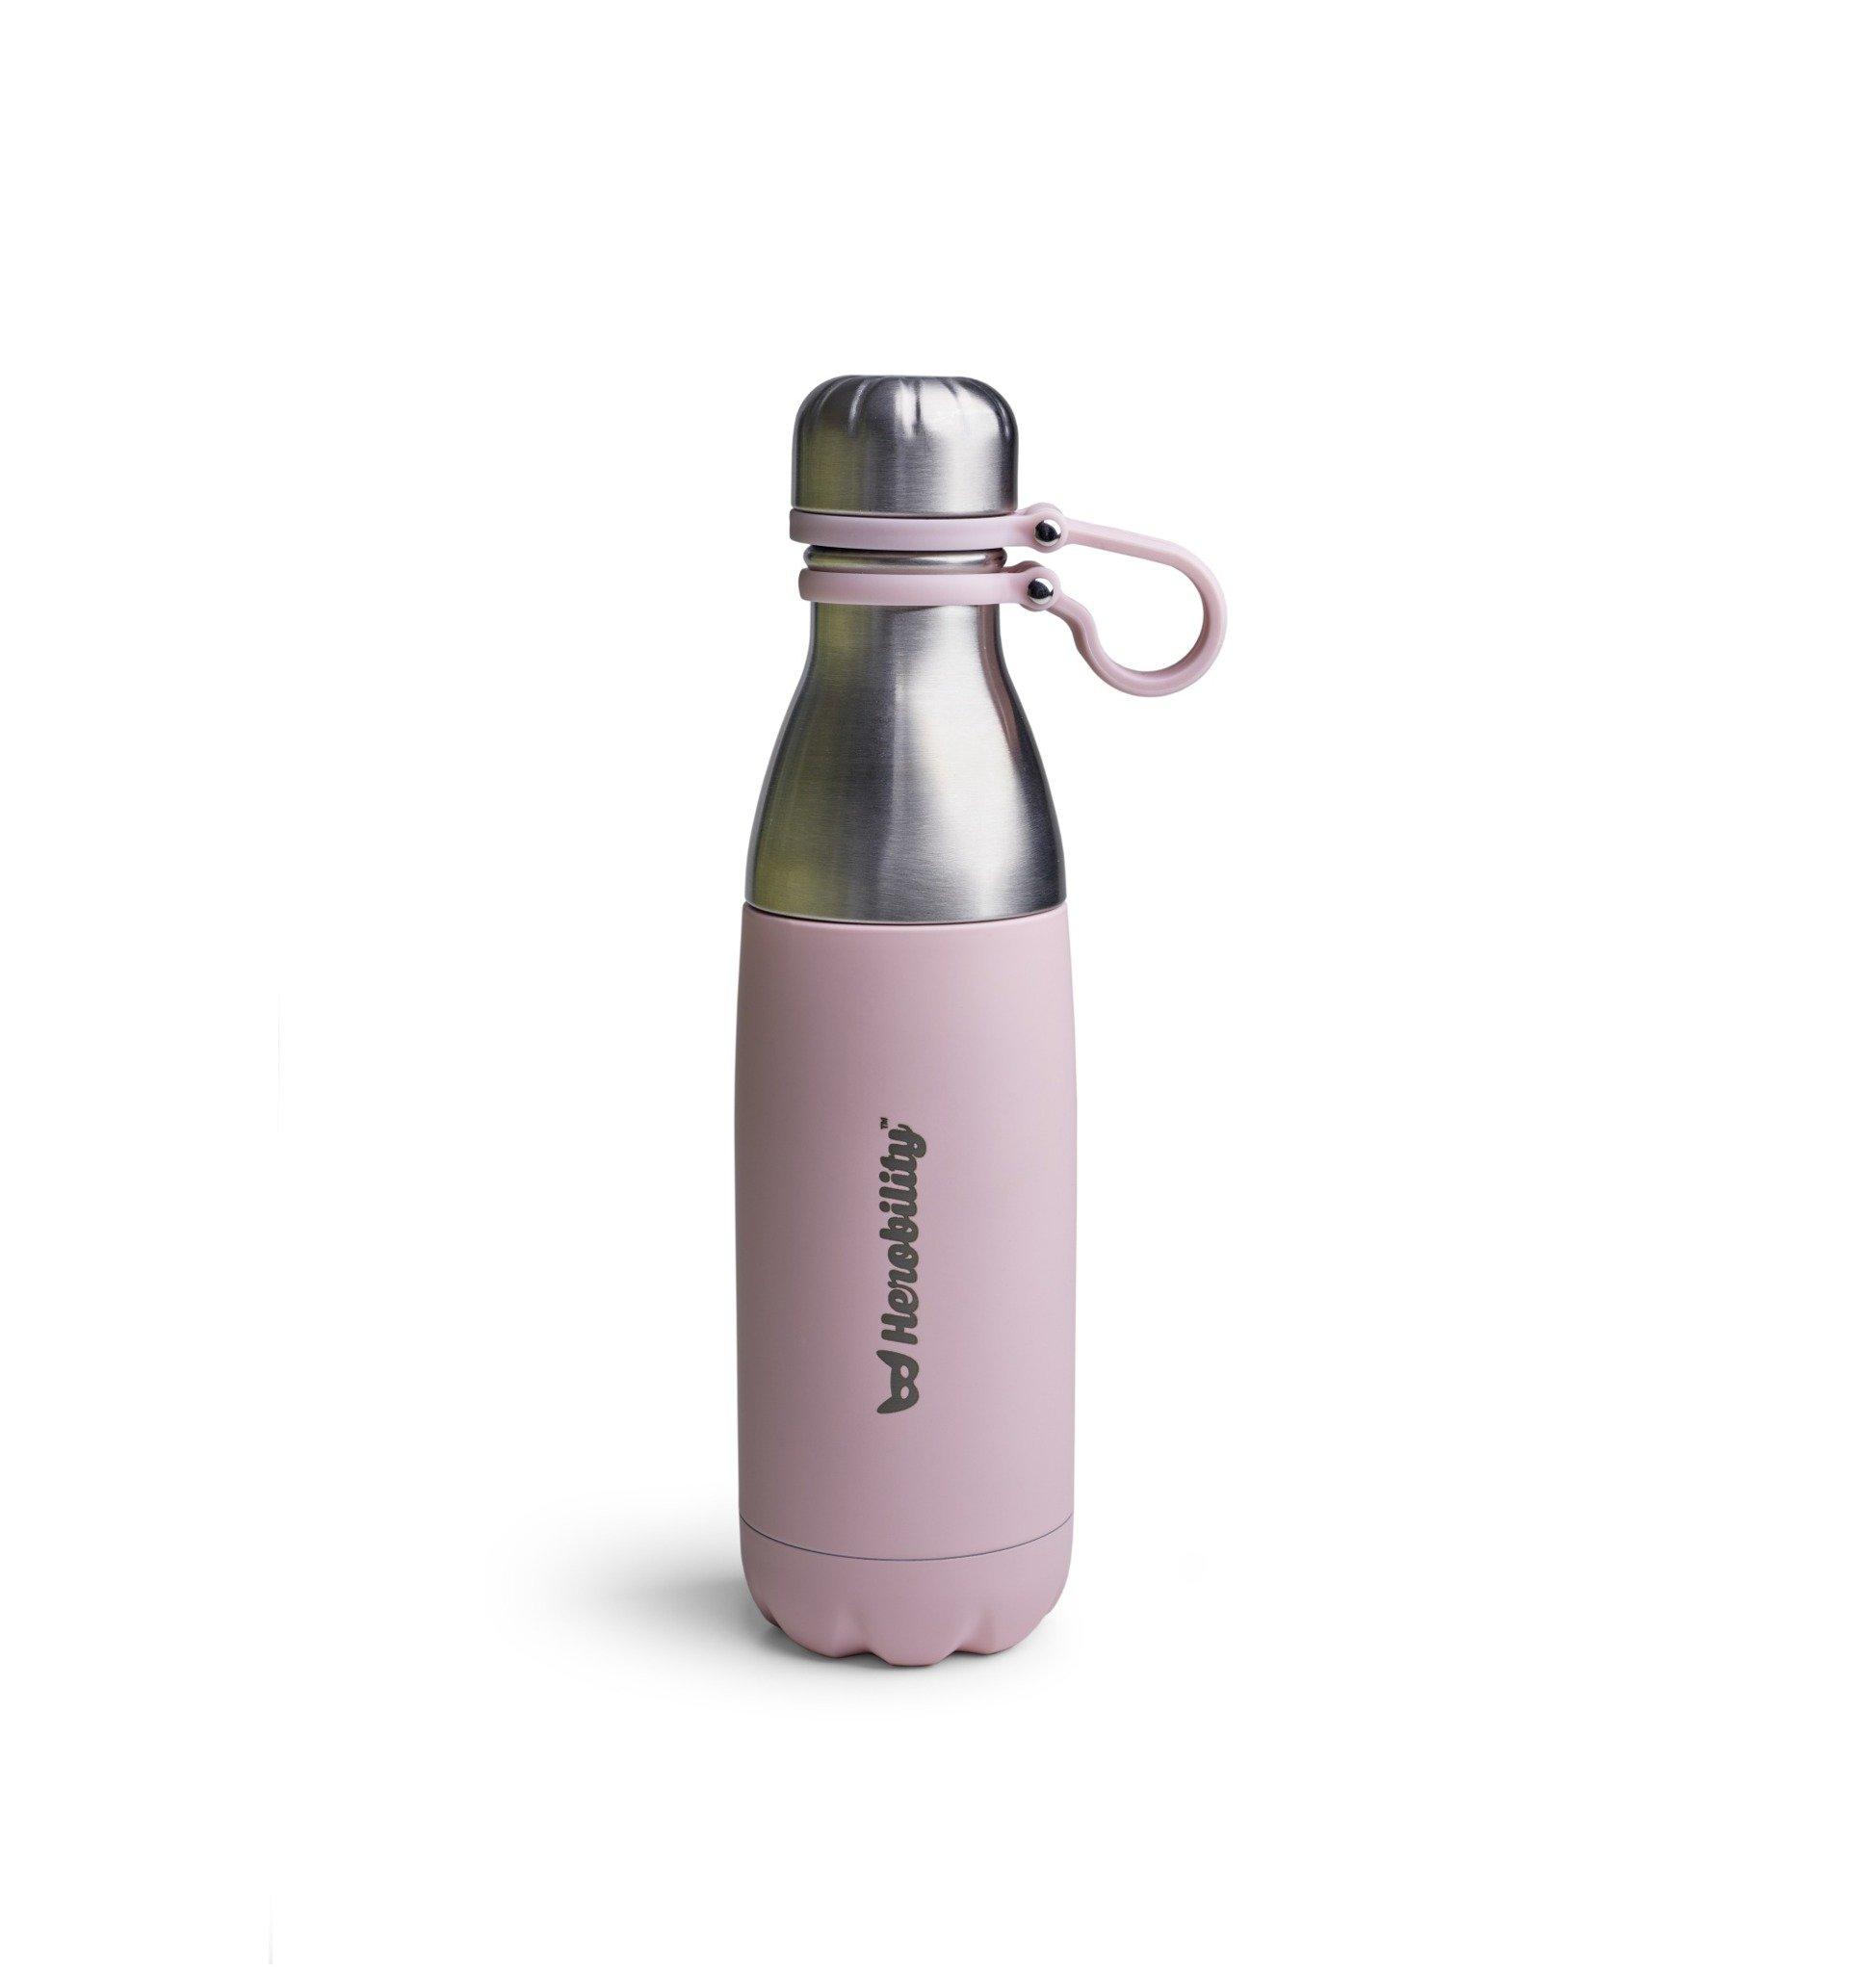 Herobility - butelka termiczna HeroGo 500ml - Różowa